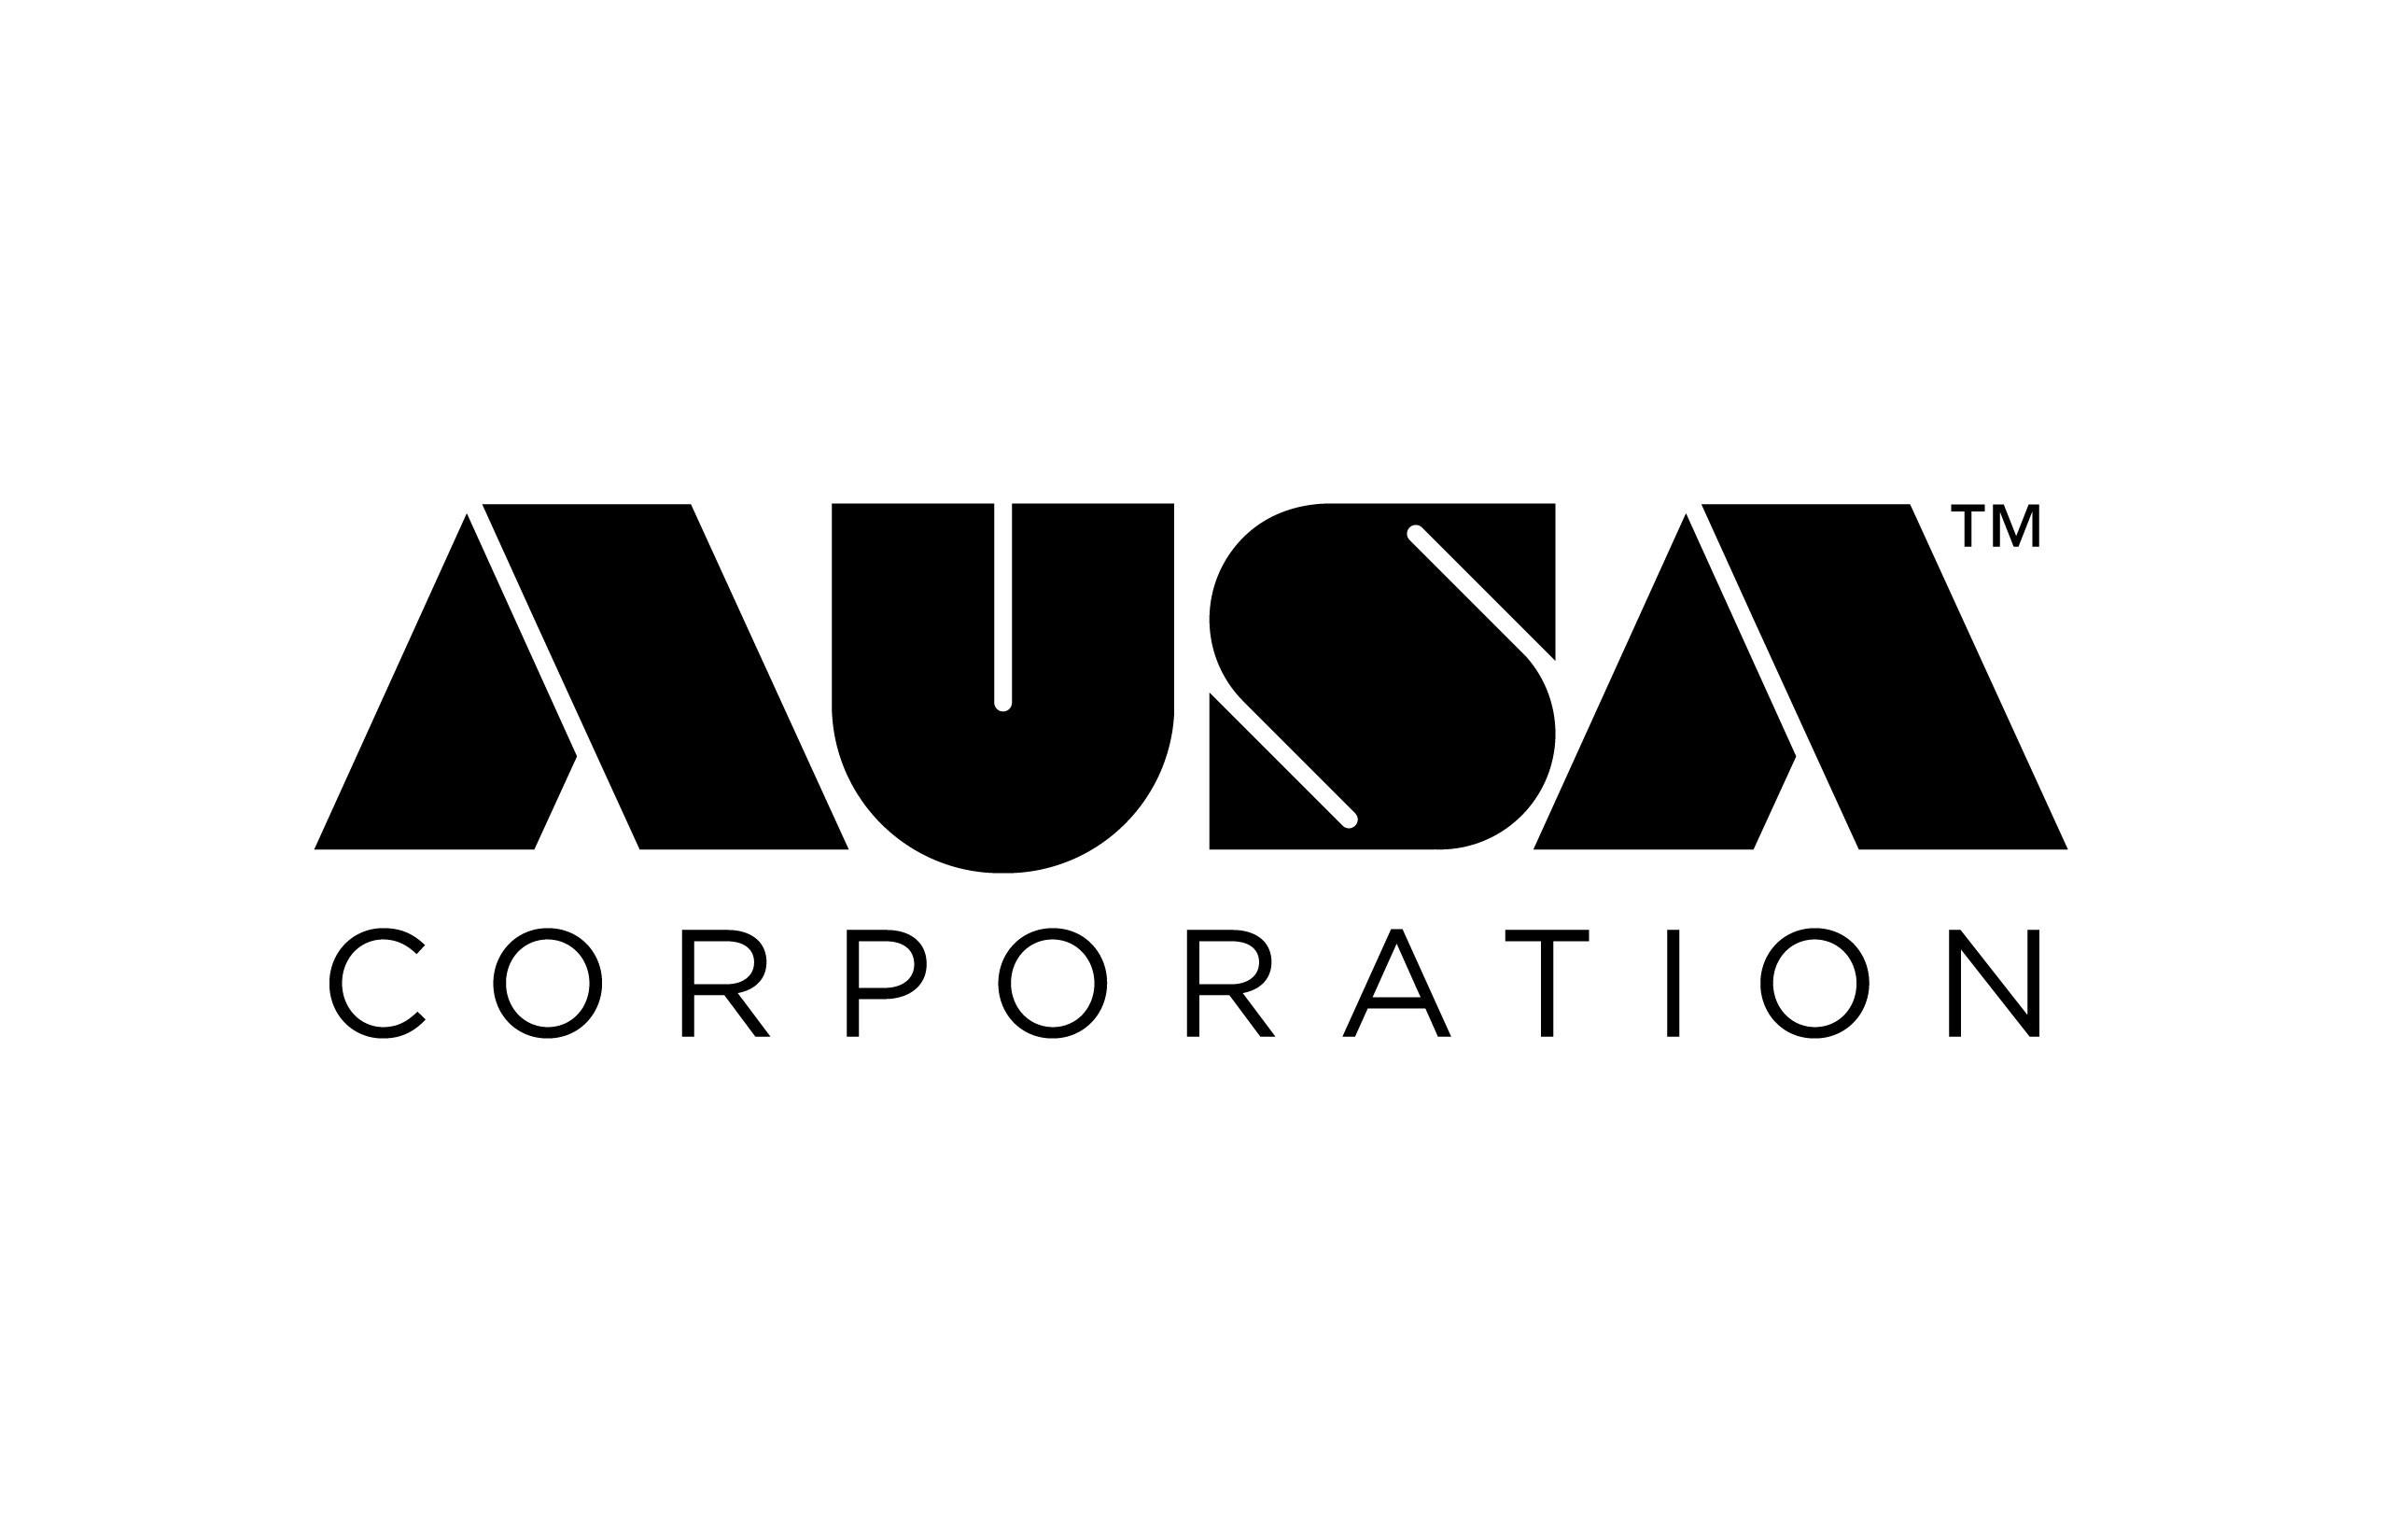 Australis Capital logo (CNW Group/Australis Capital Inc.)